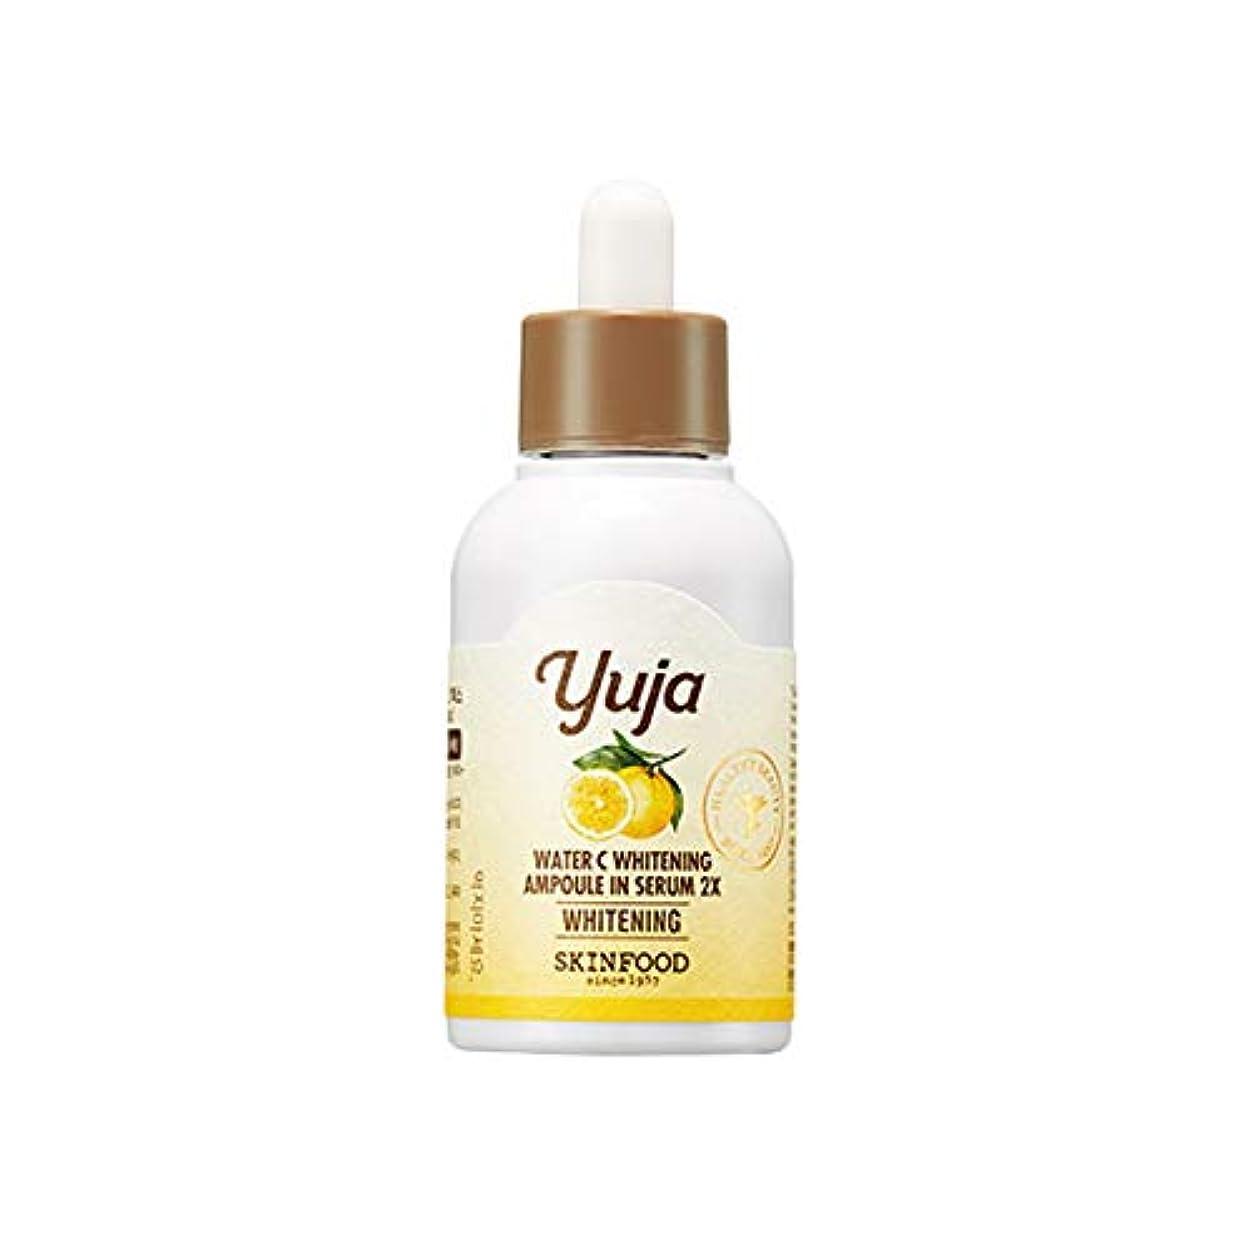 海岸ヒープ近似Skinfood Yuja Water C Whitening Ampoule In Serum 2X/50ml [並行輸入品]